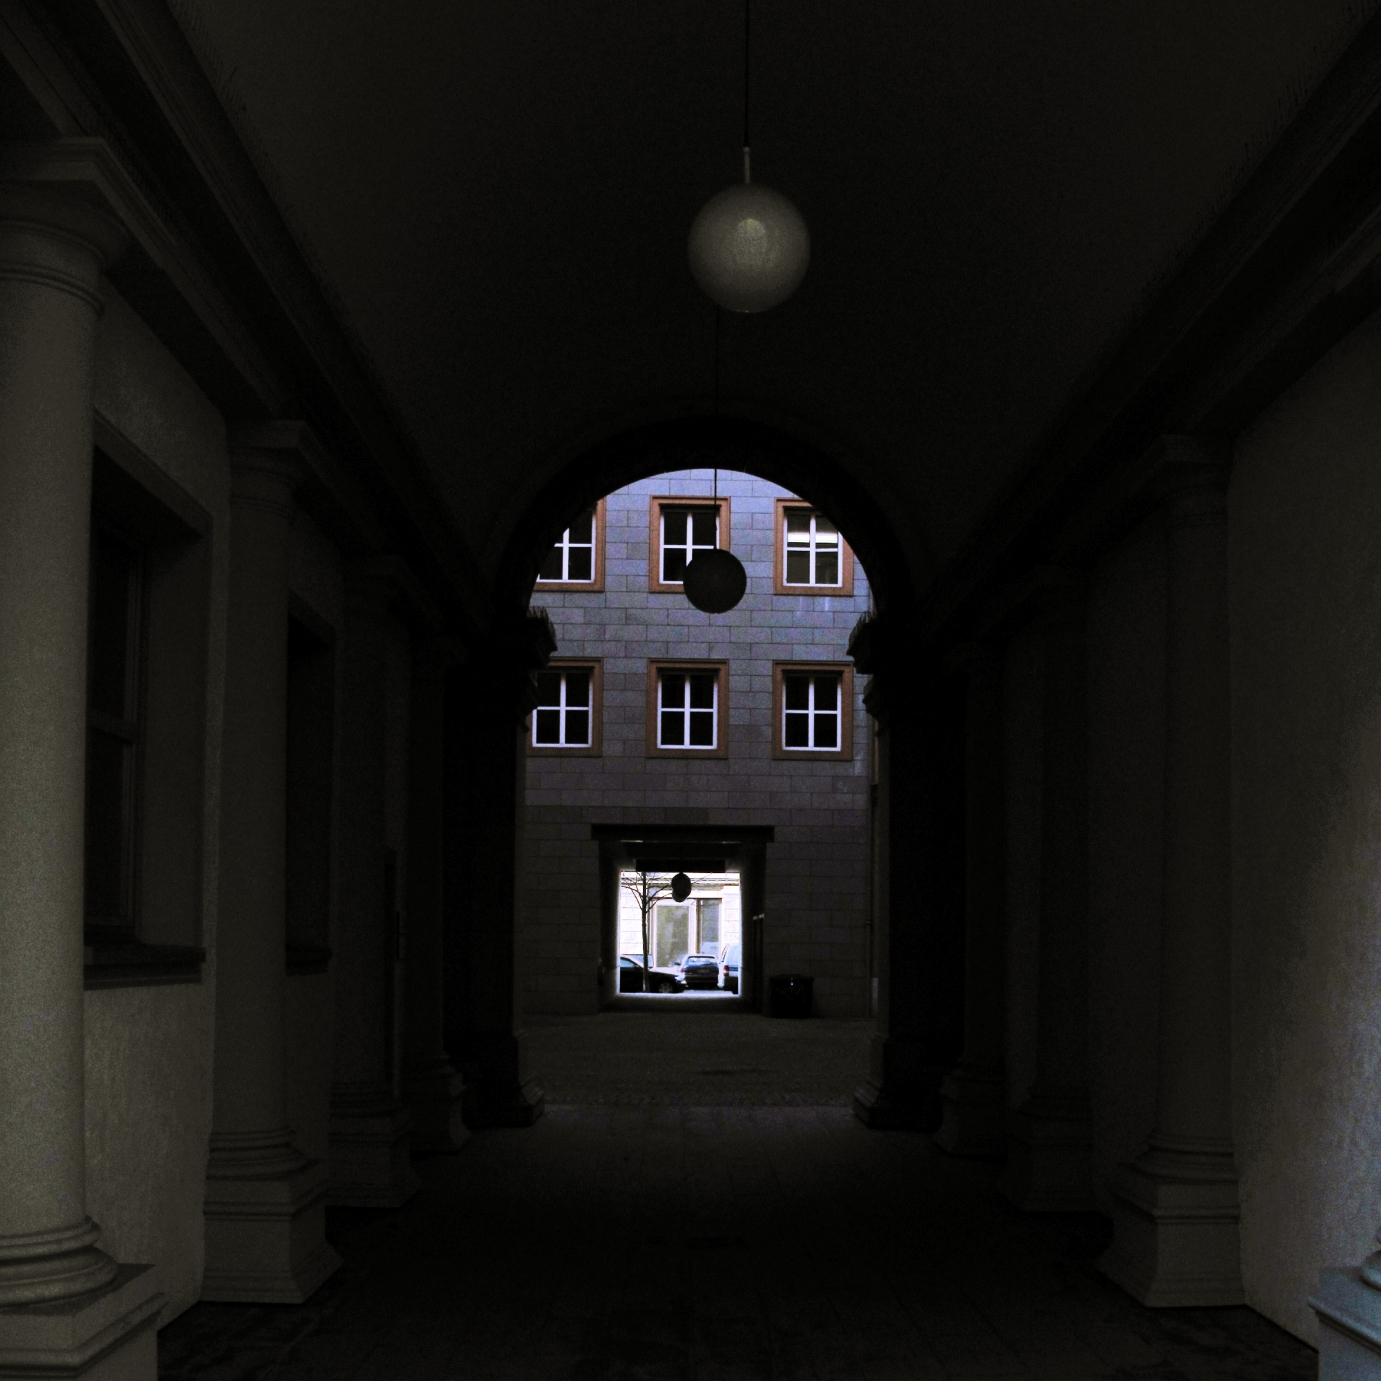 Berlin alley, 9.02.09